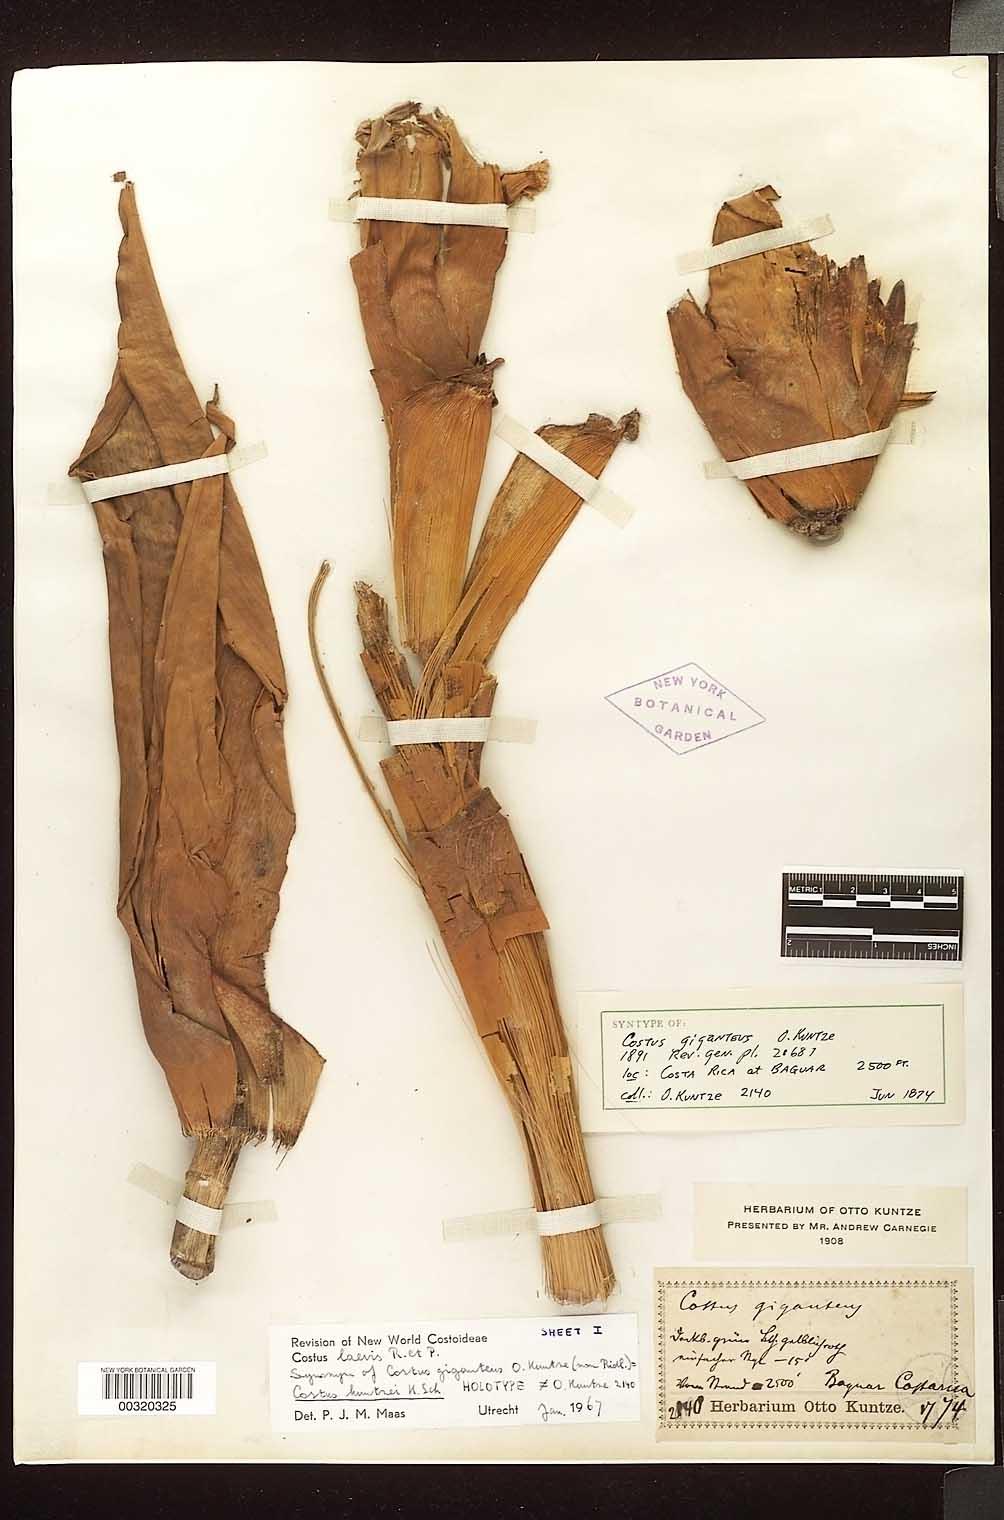 Photo# 17973 - Herbarium sheet 1, Costus gigantea syntype at NYBG